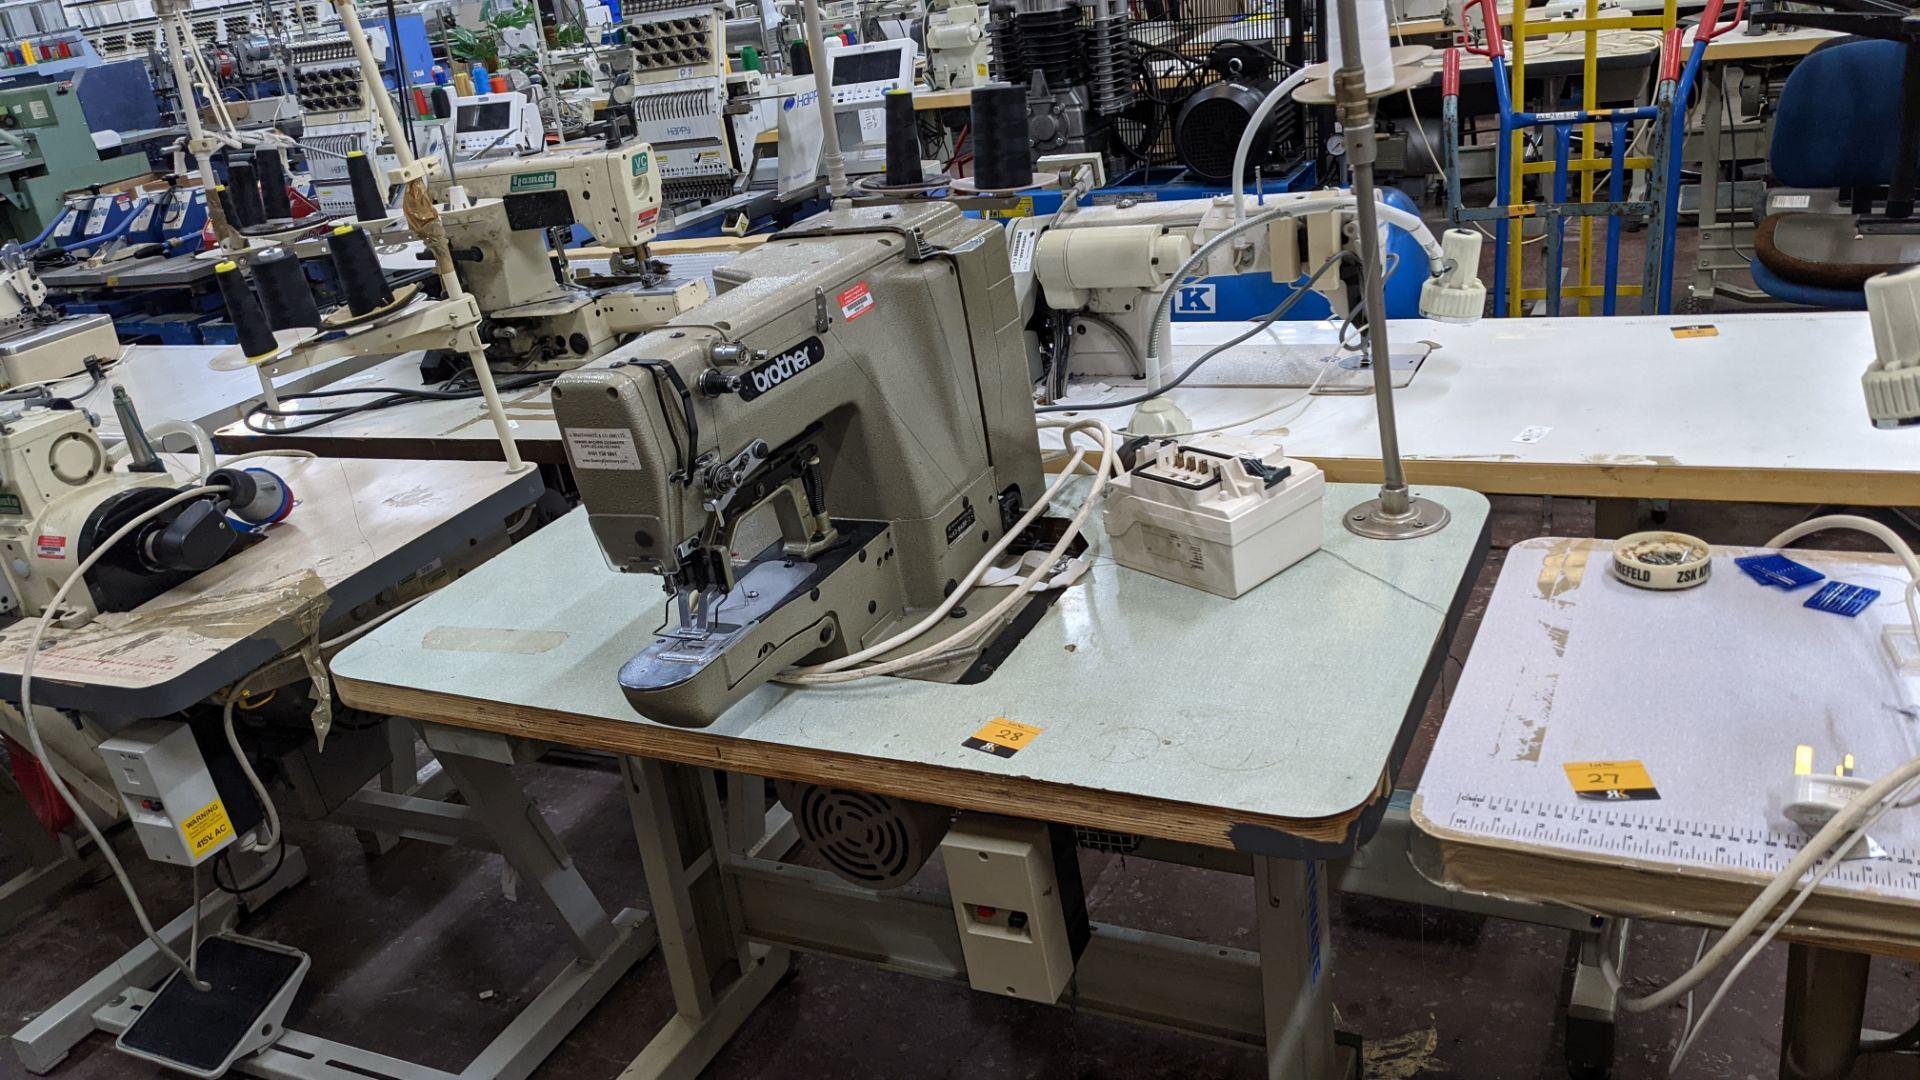 Brother bar tack sewing machine model LK3-B430-2 - Image 2 of 15